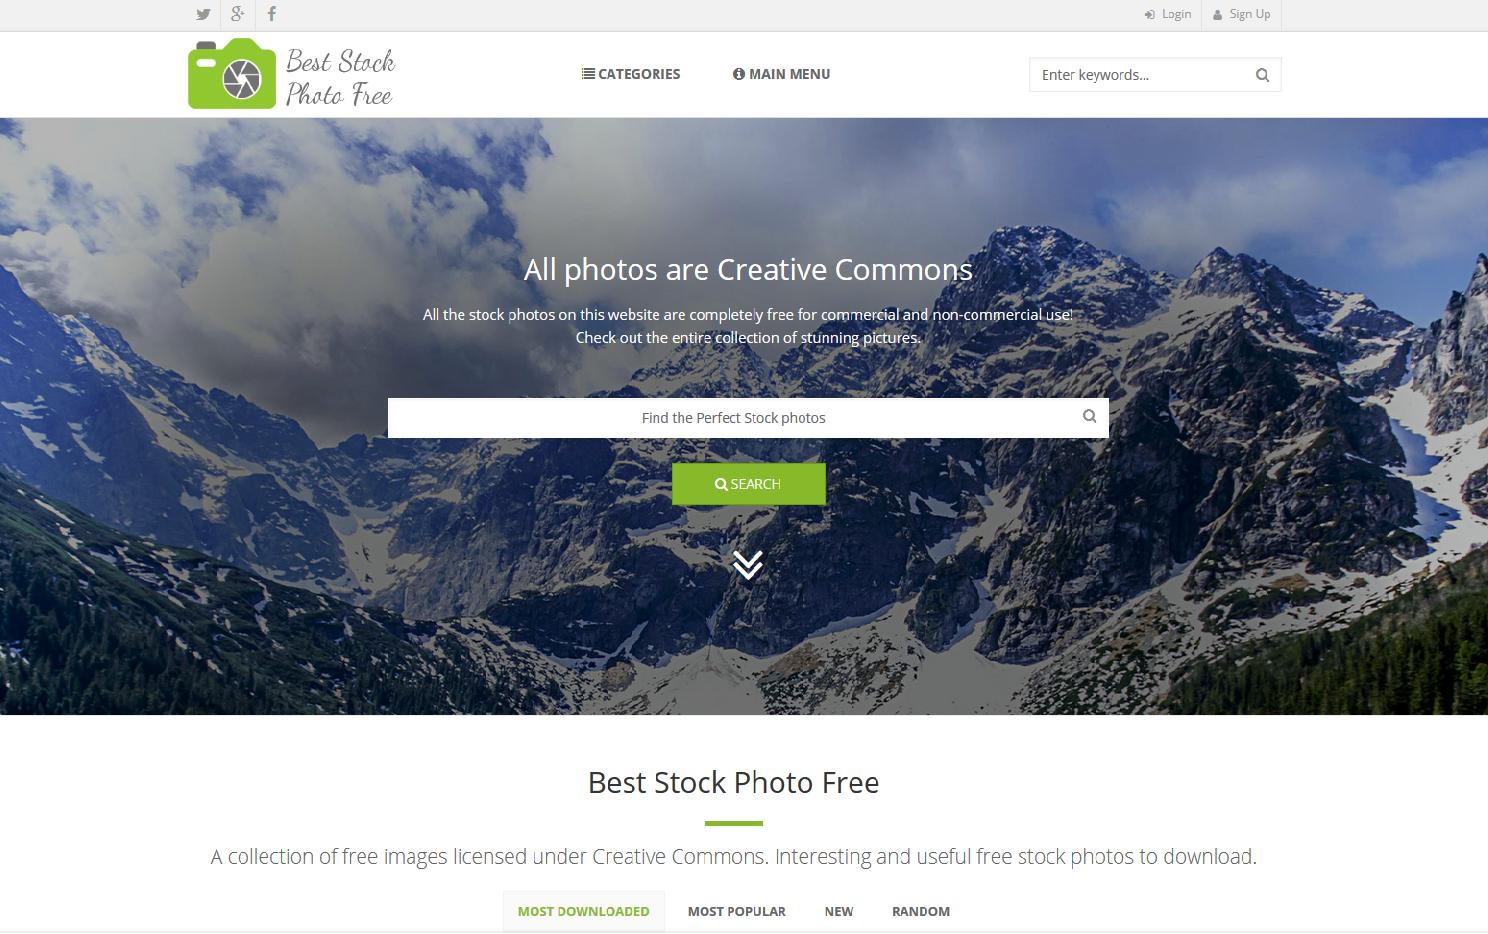 best stock photo free